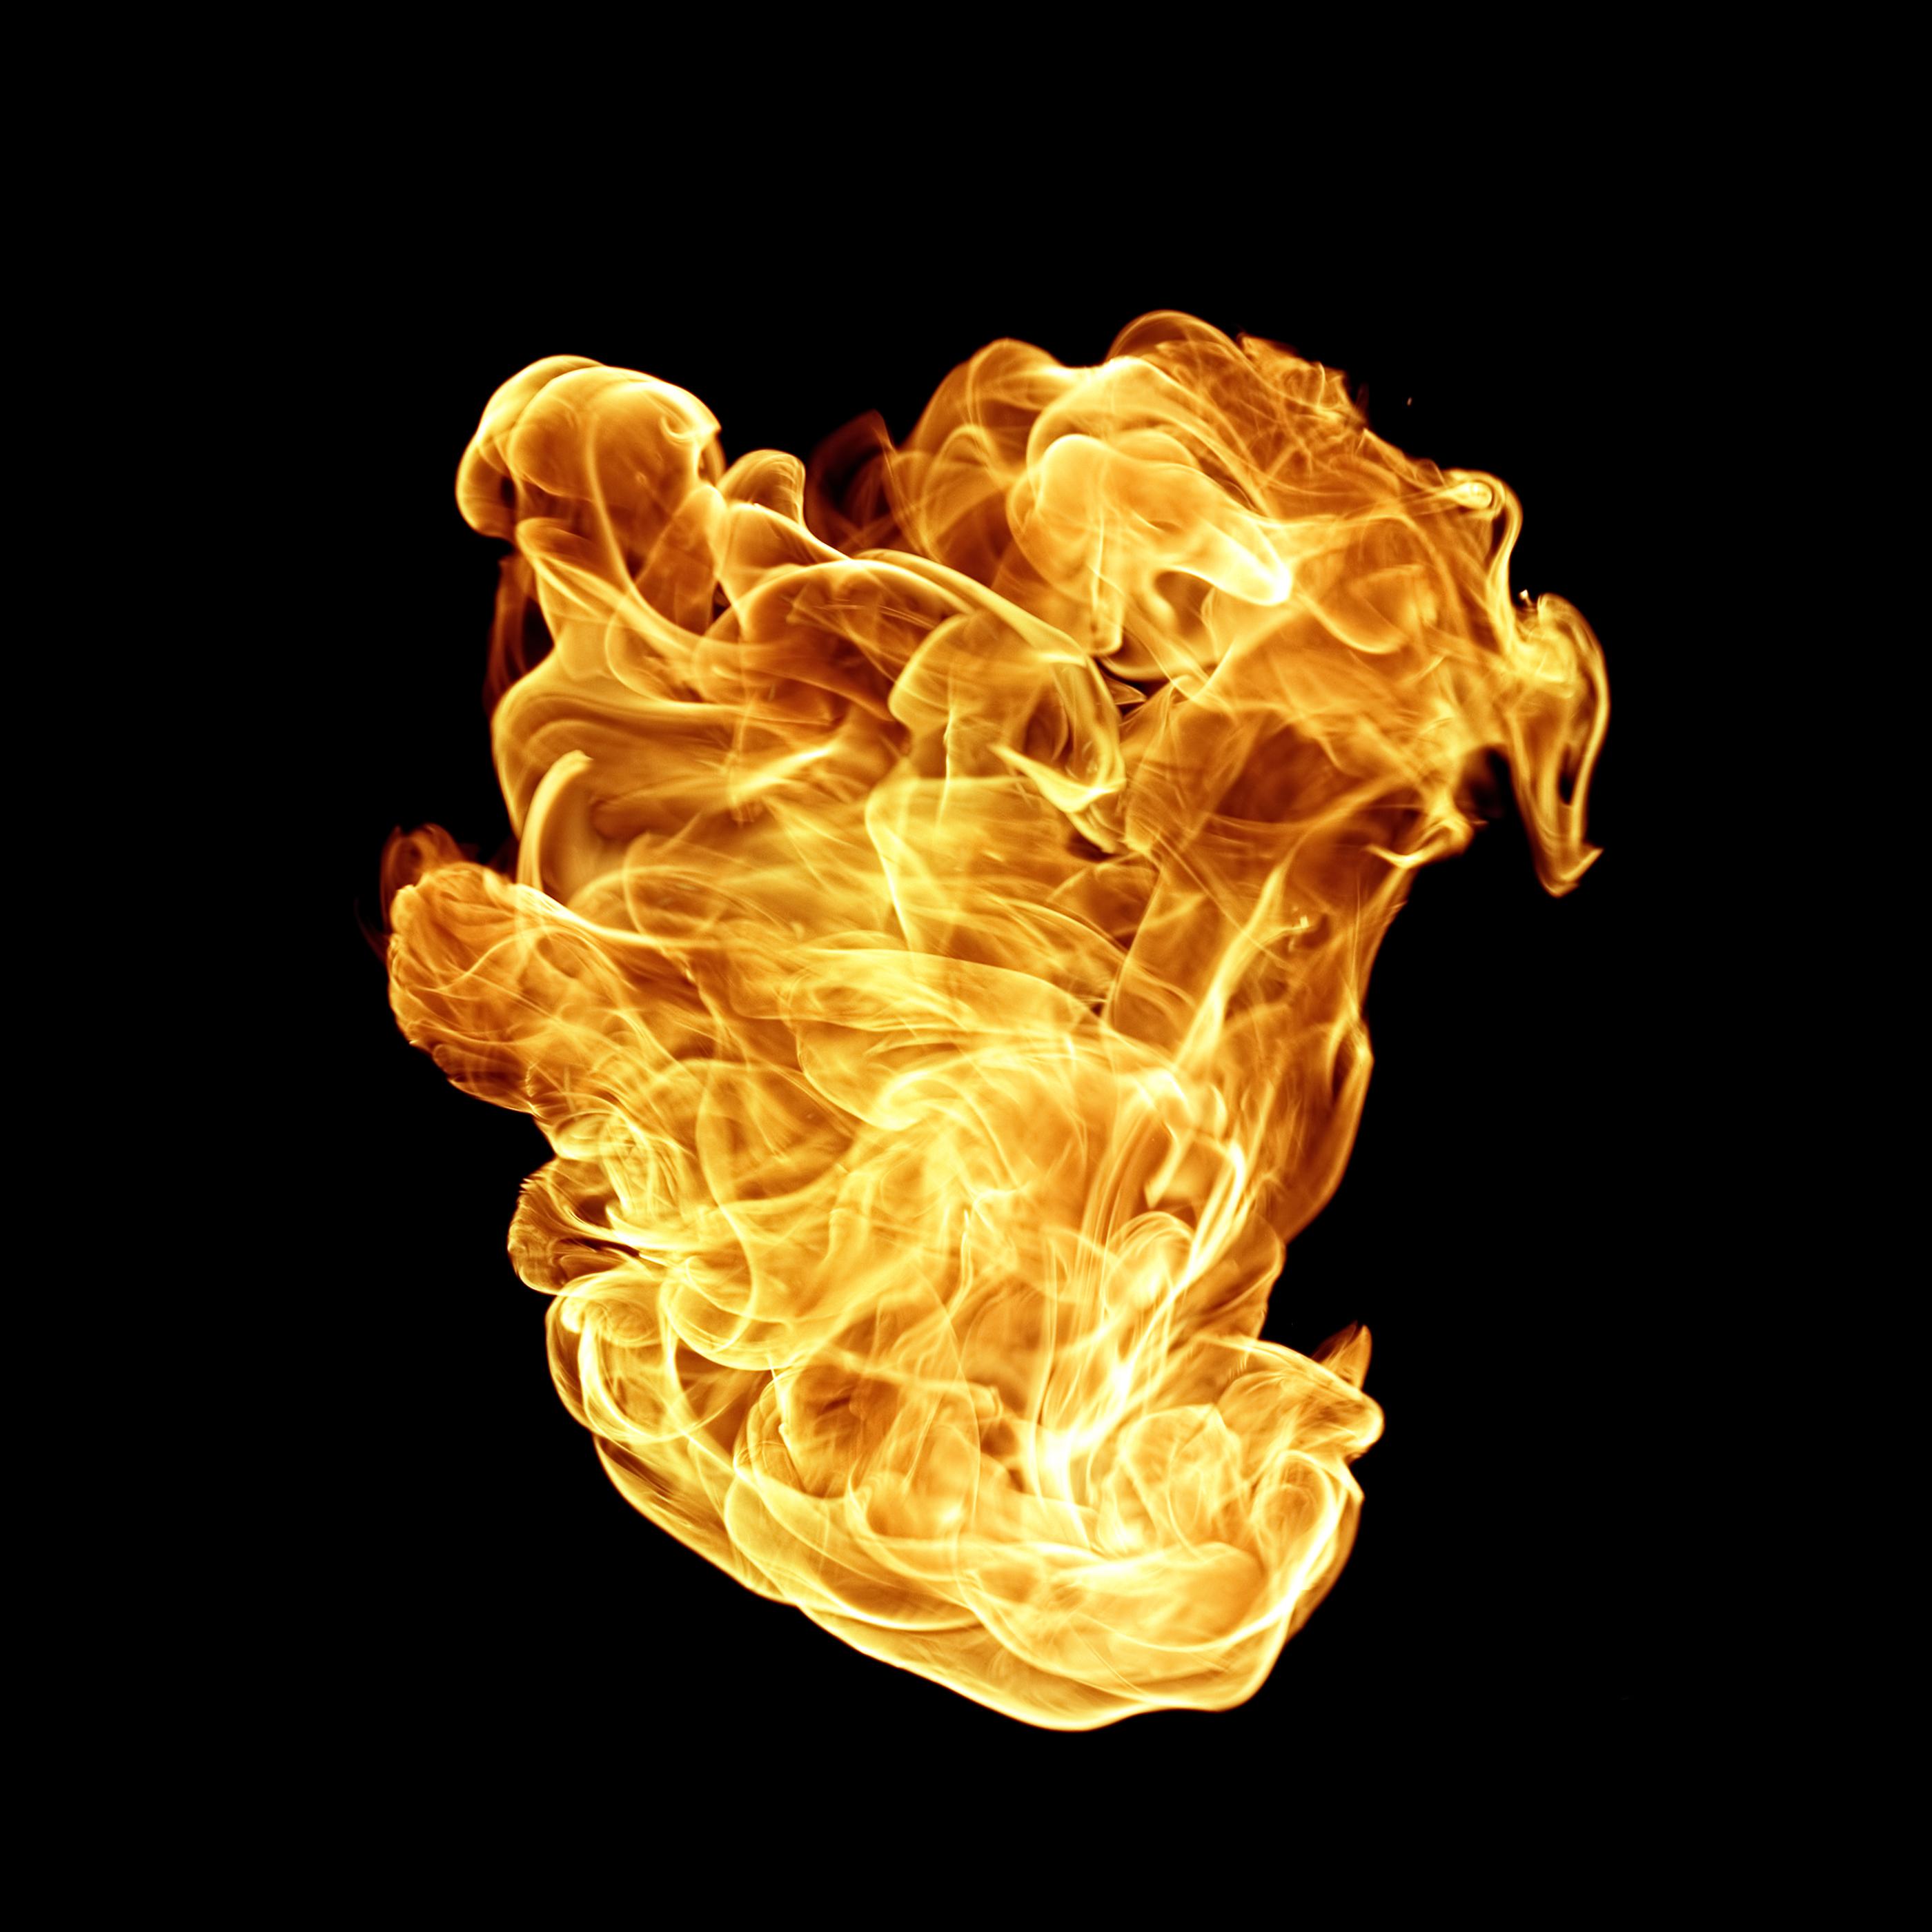 Flame, Beautiful, Orange, Ignite, Inferno, HQ Photo